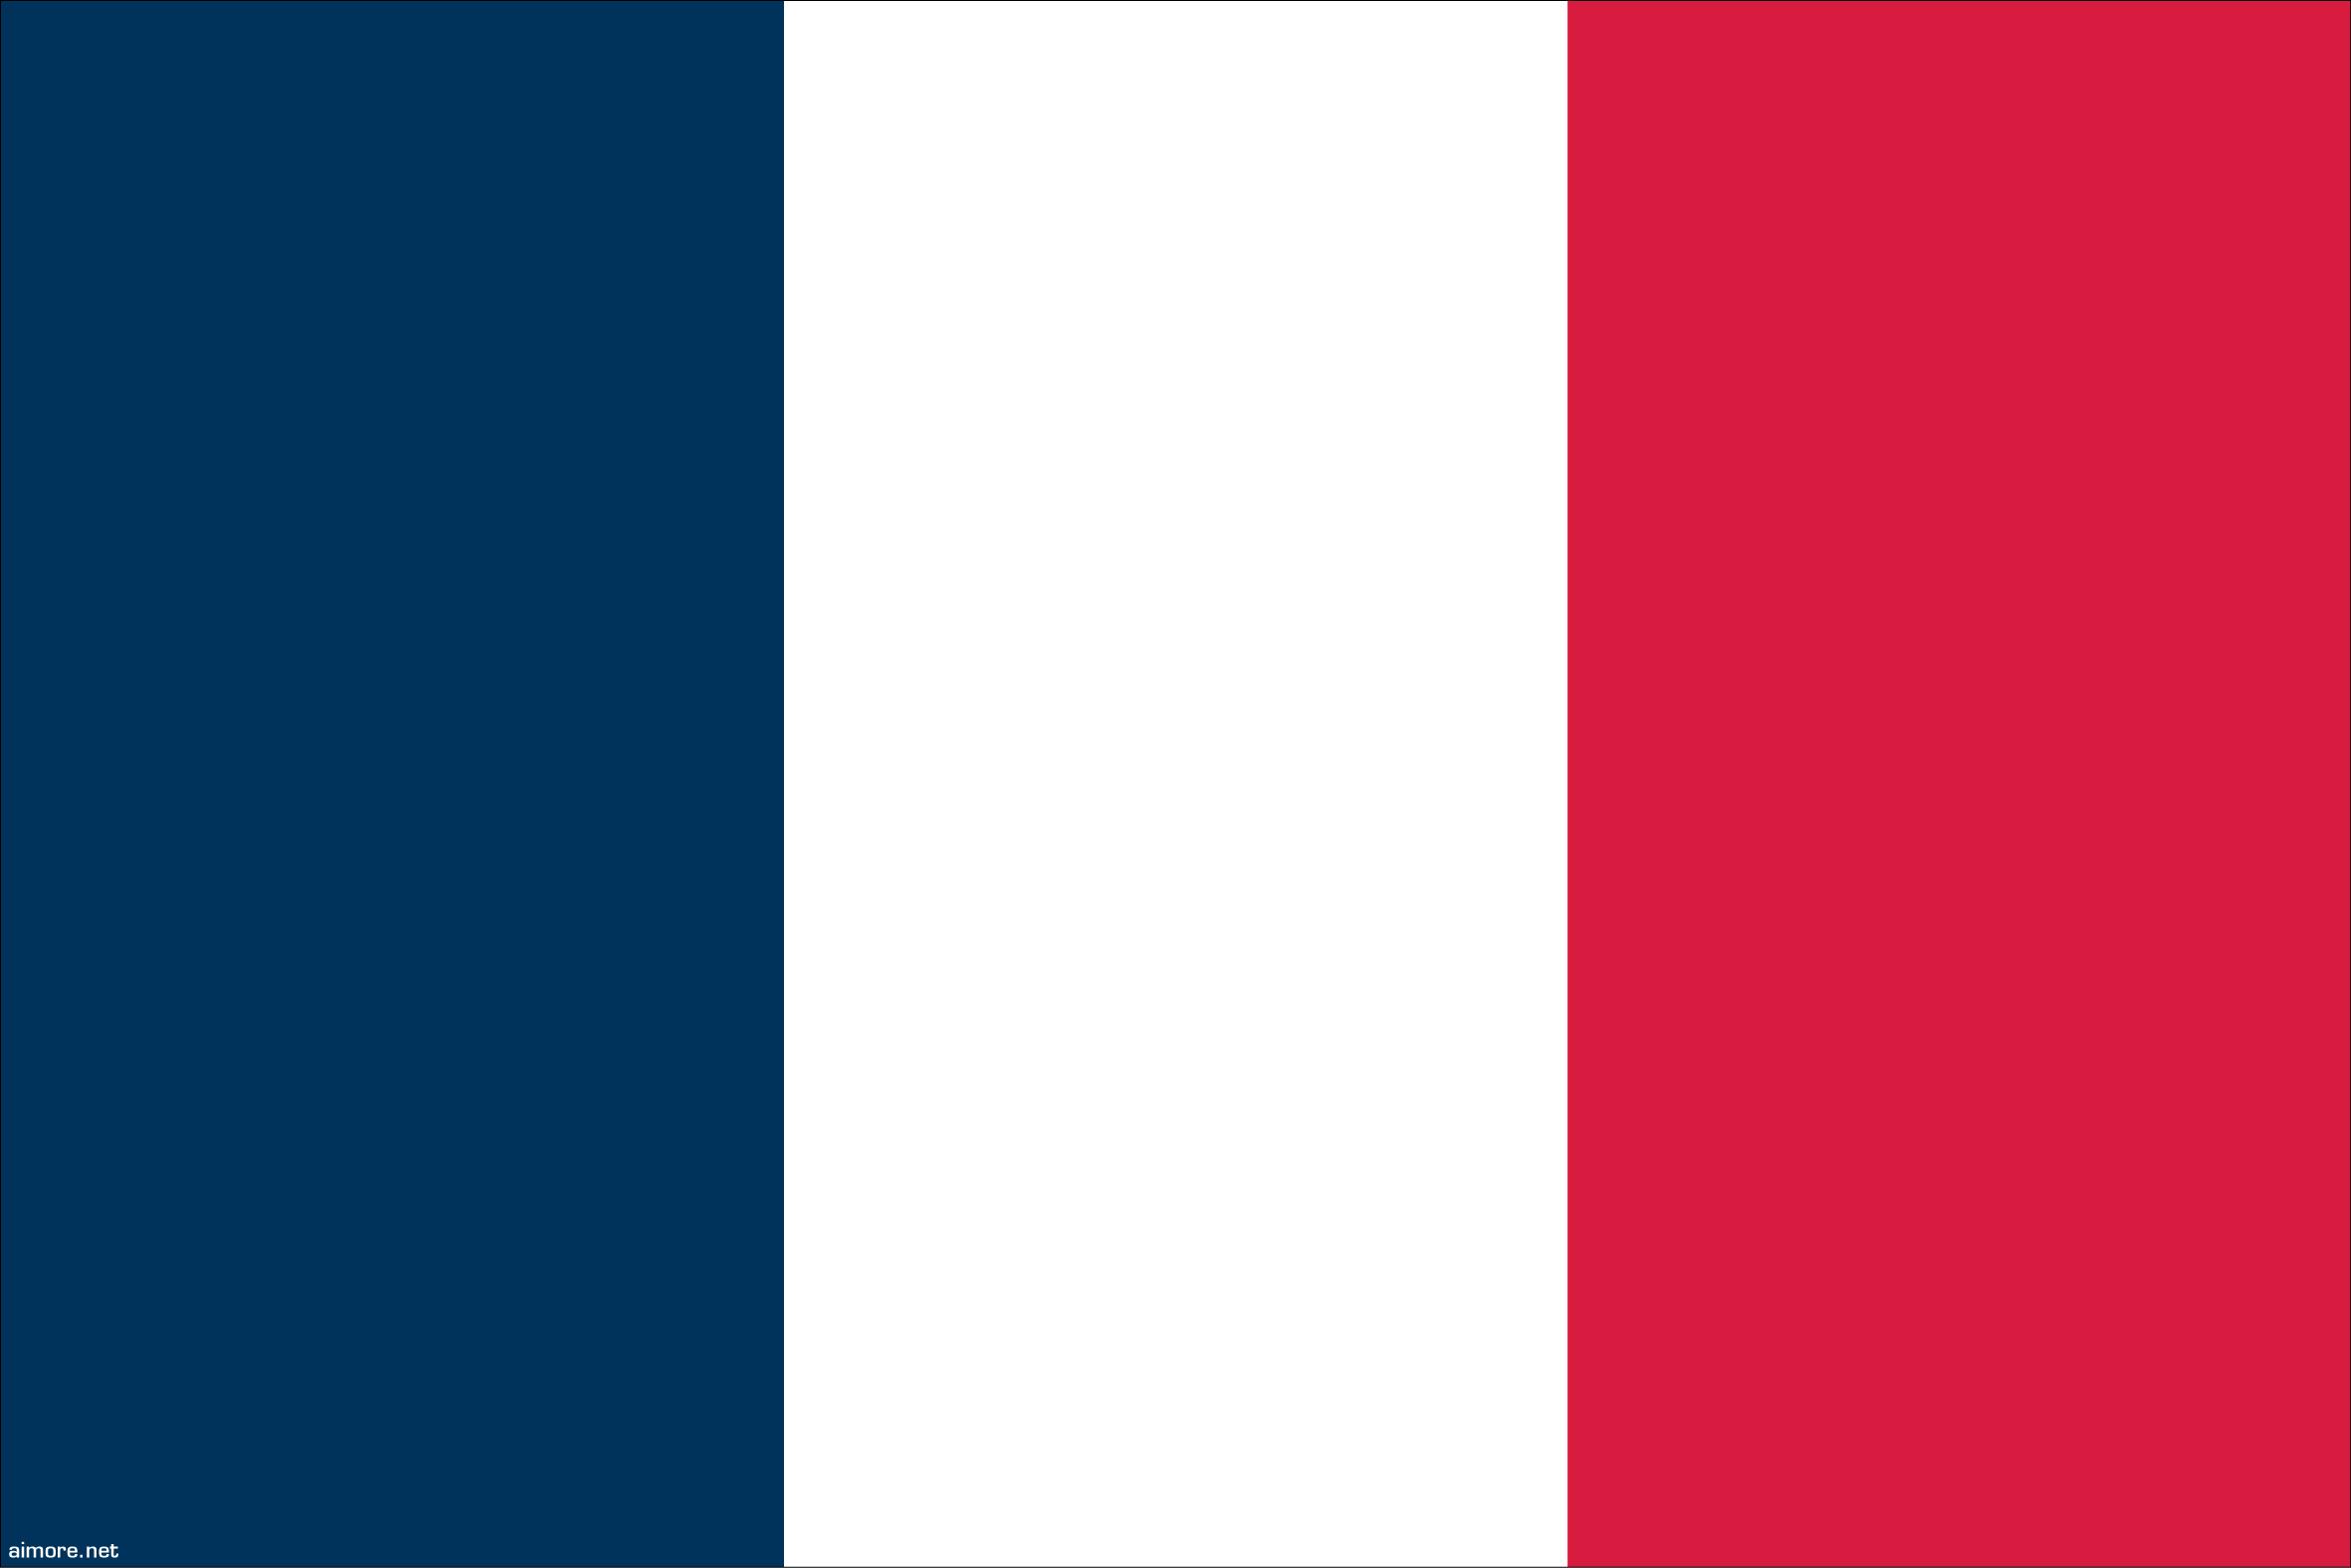 Traduisez au Français/French